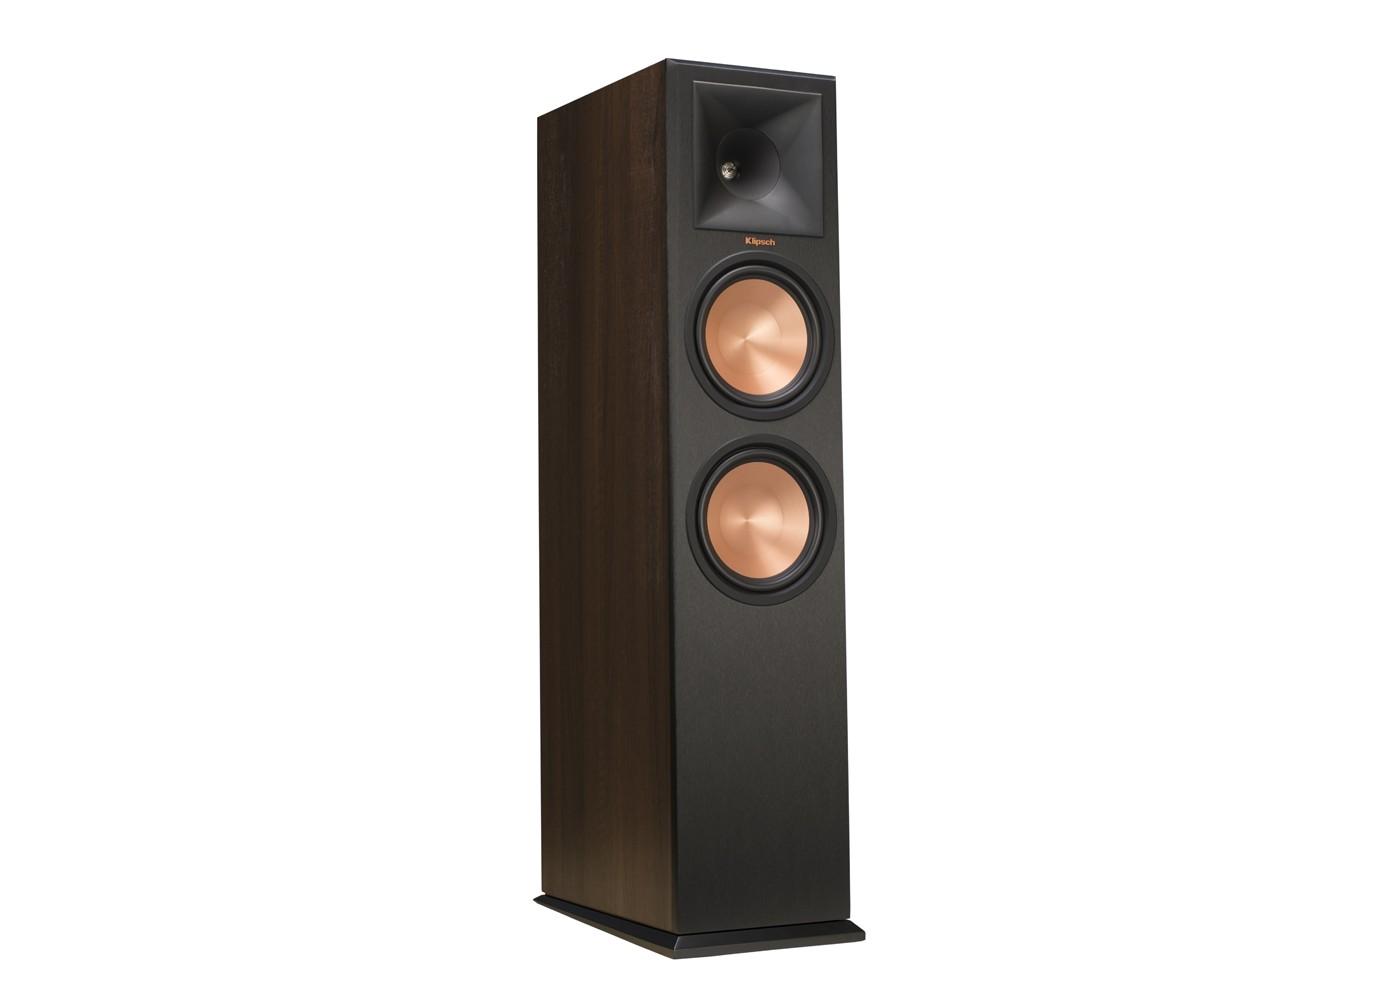 Definitive Technology Ceiling Speakerssafeandsoundhq Lifestyle 235 Home Theater Wiring Diagram For Klipsch Rp 280f Wl Walnut Floorstanding Speaker